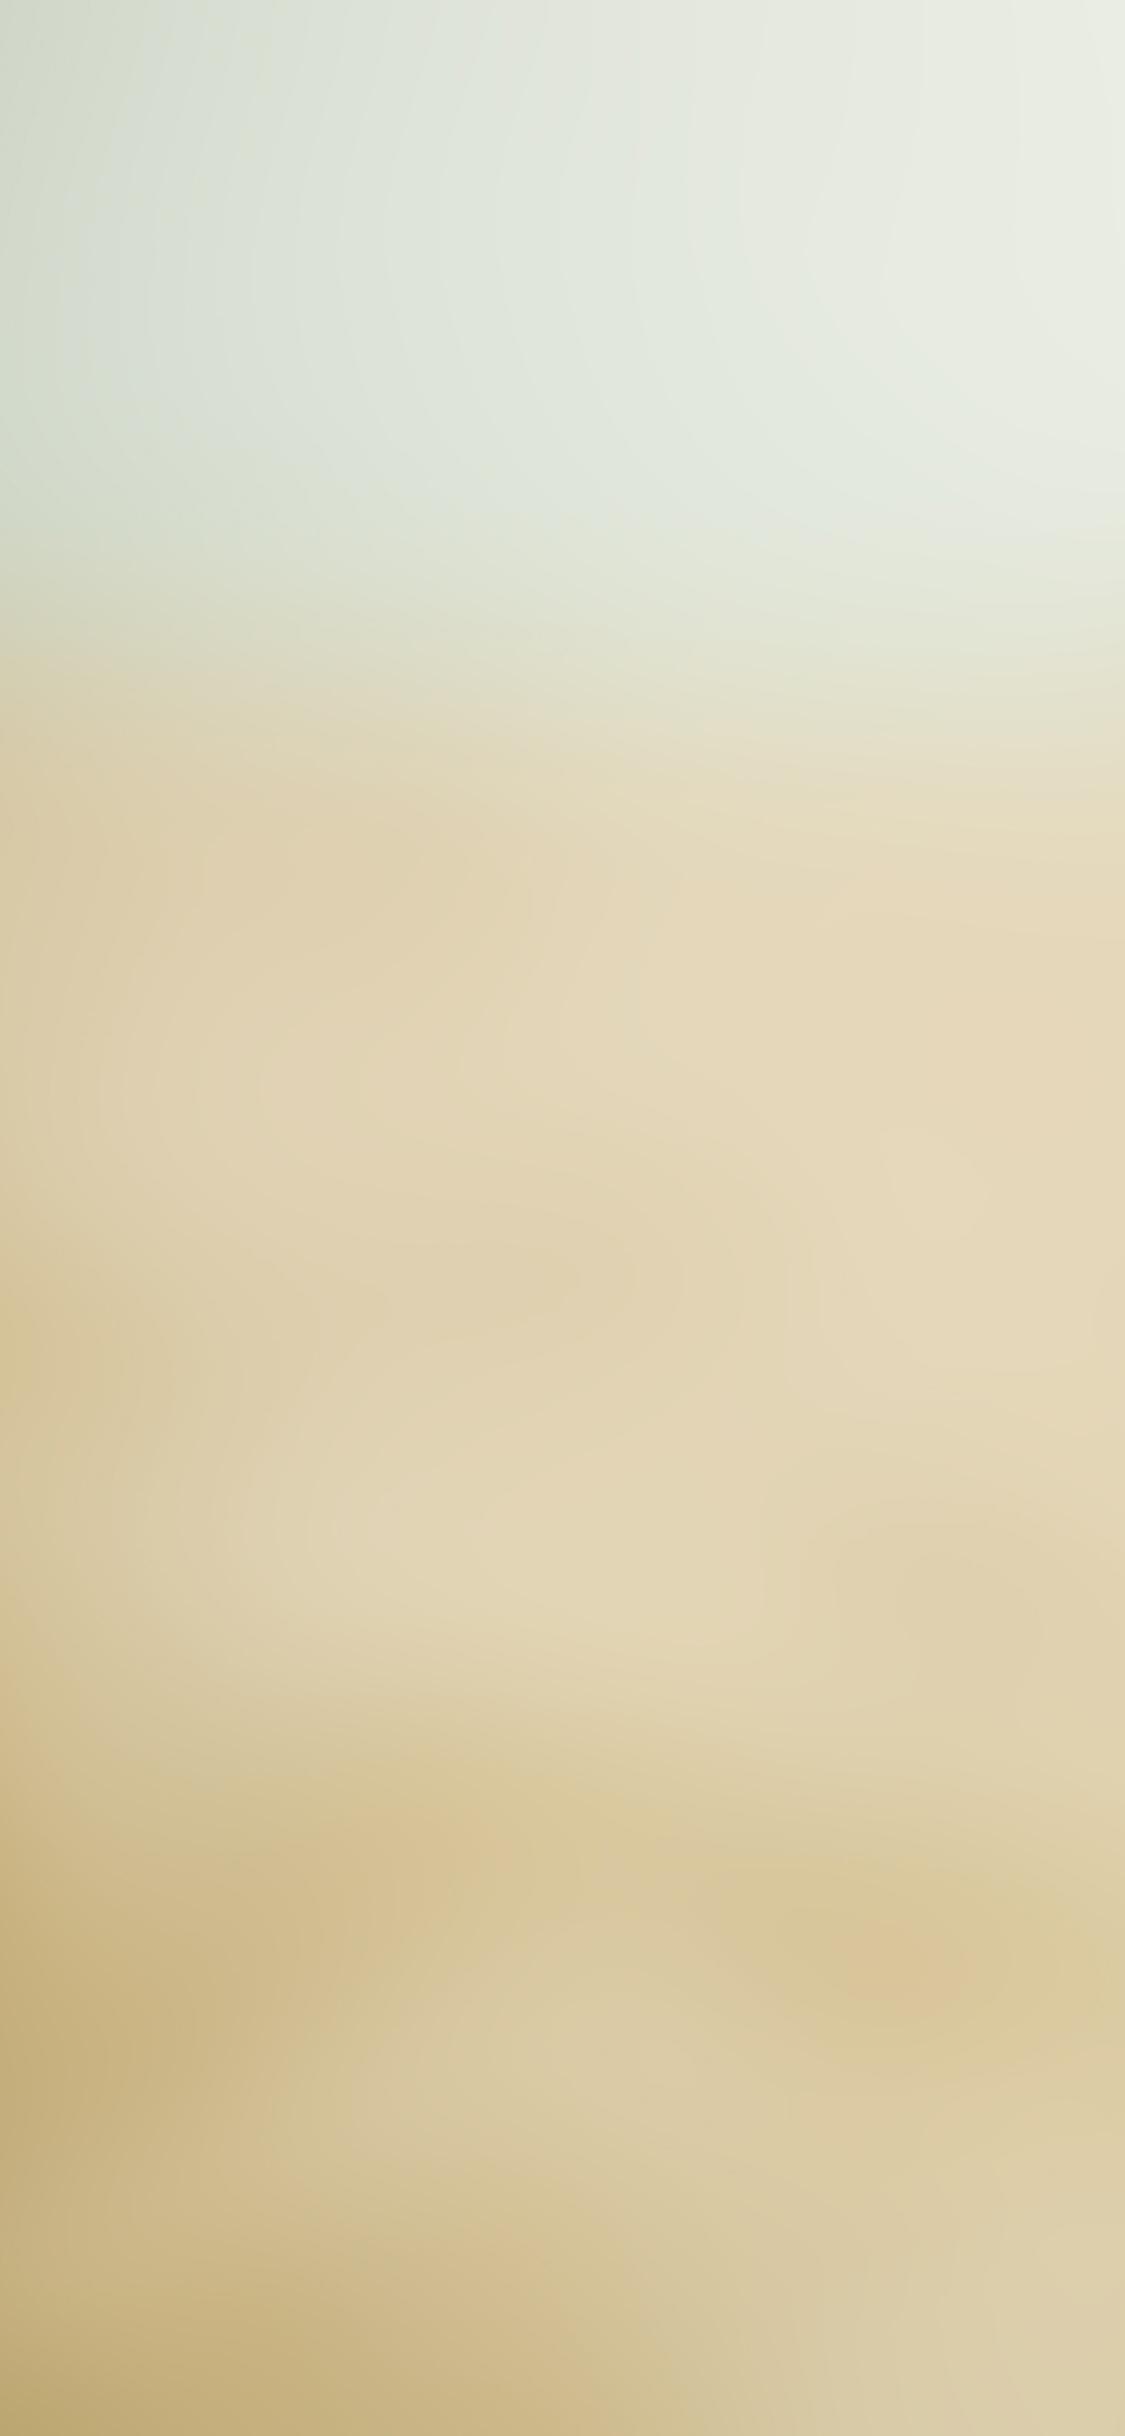 iPhoneXpapers.com-Apple-iPhone-wallpaper-sd19-sand-storm-gradient-blur